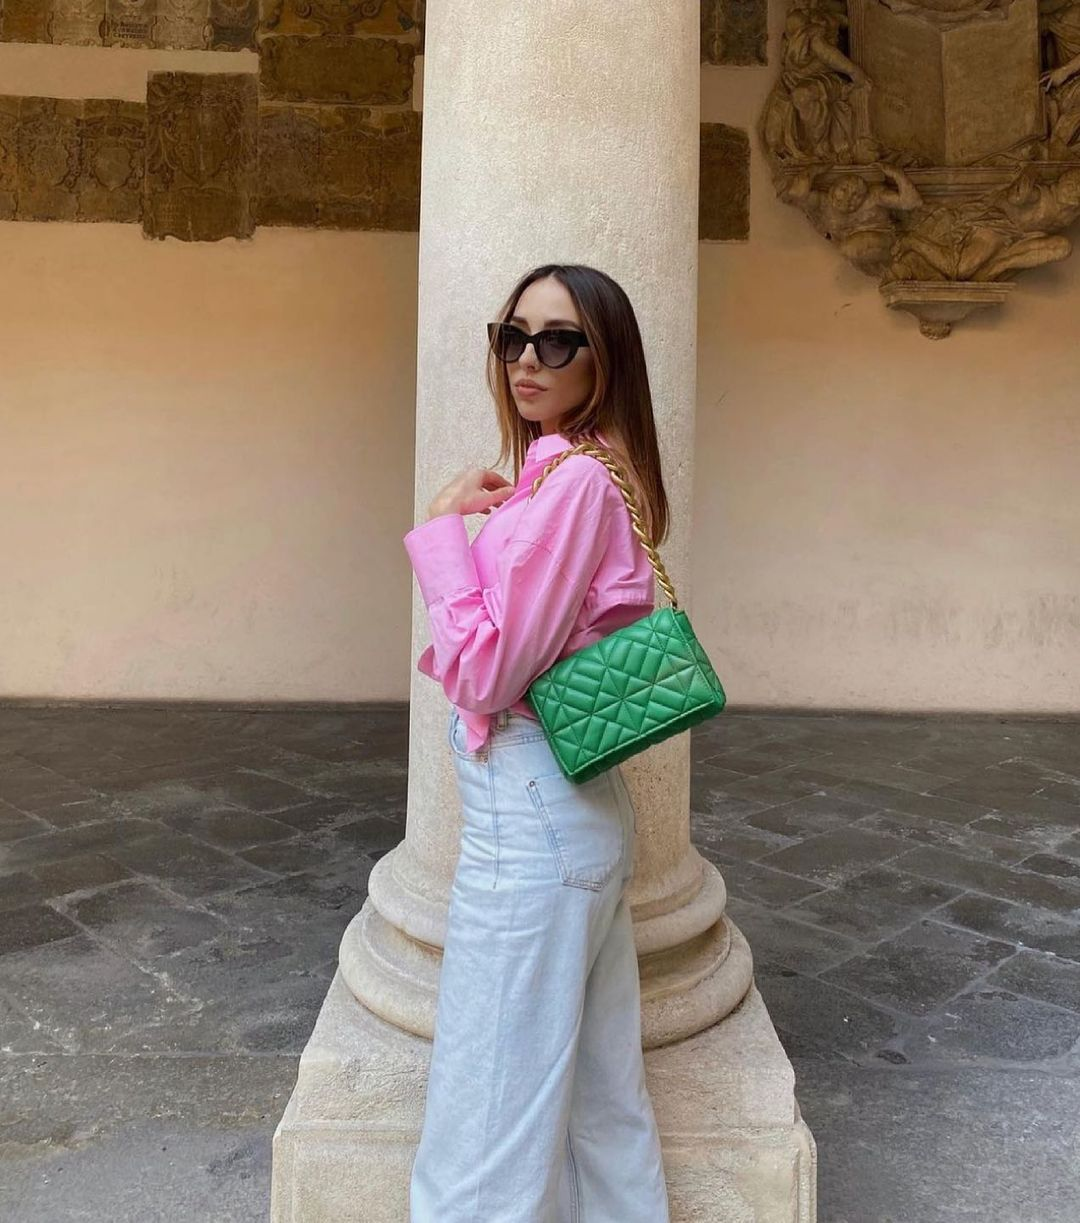 medium quilted shoulder bag with chain de Zara sur zara.style.daily